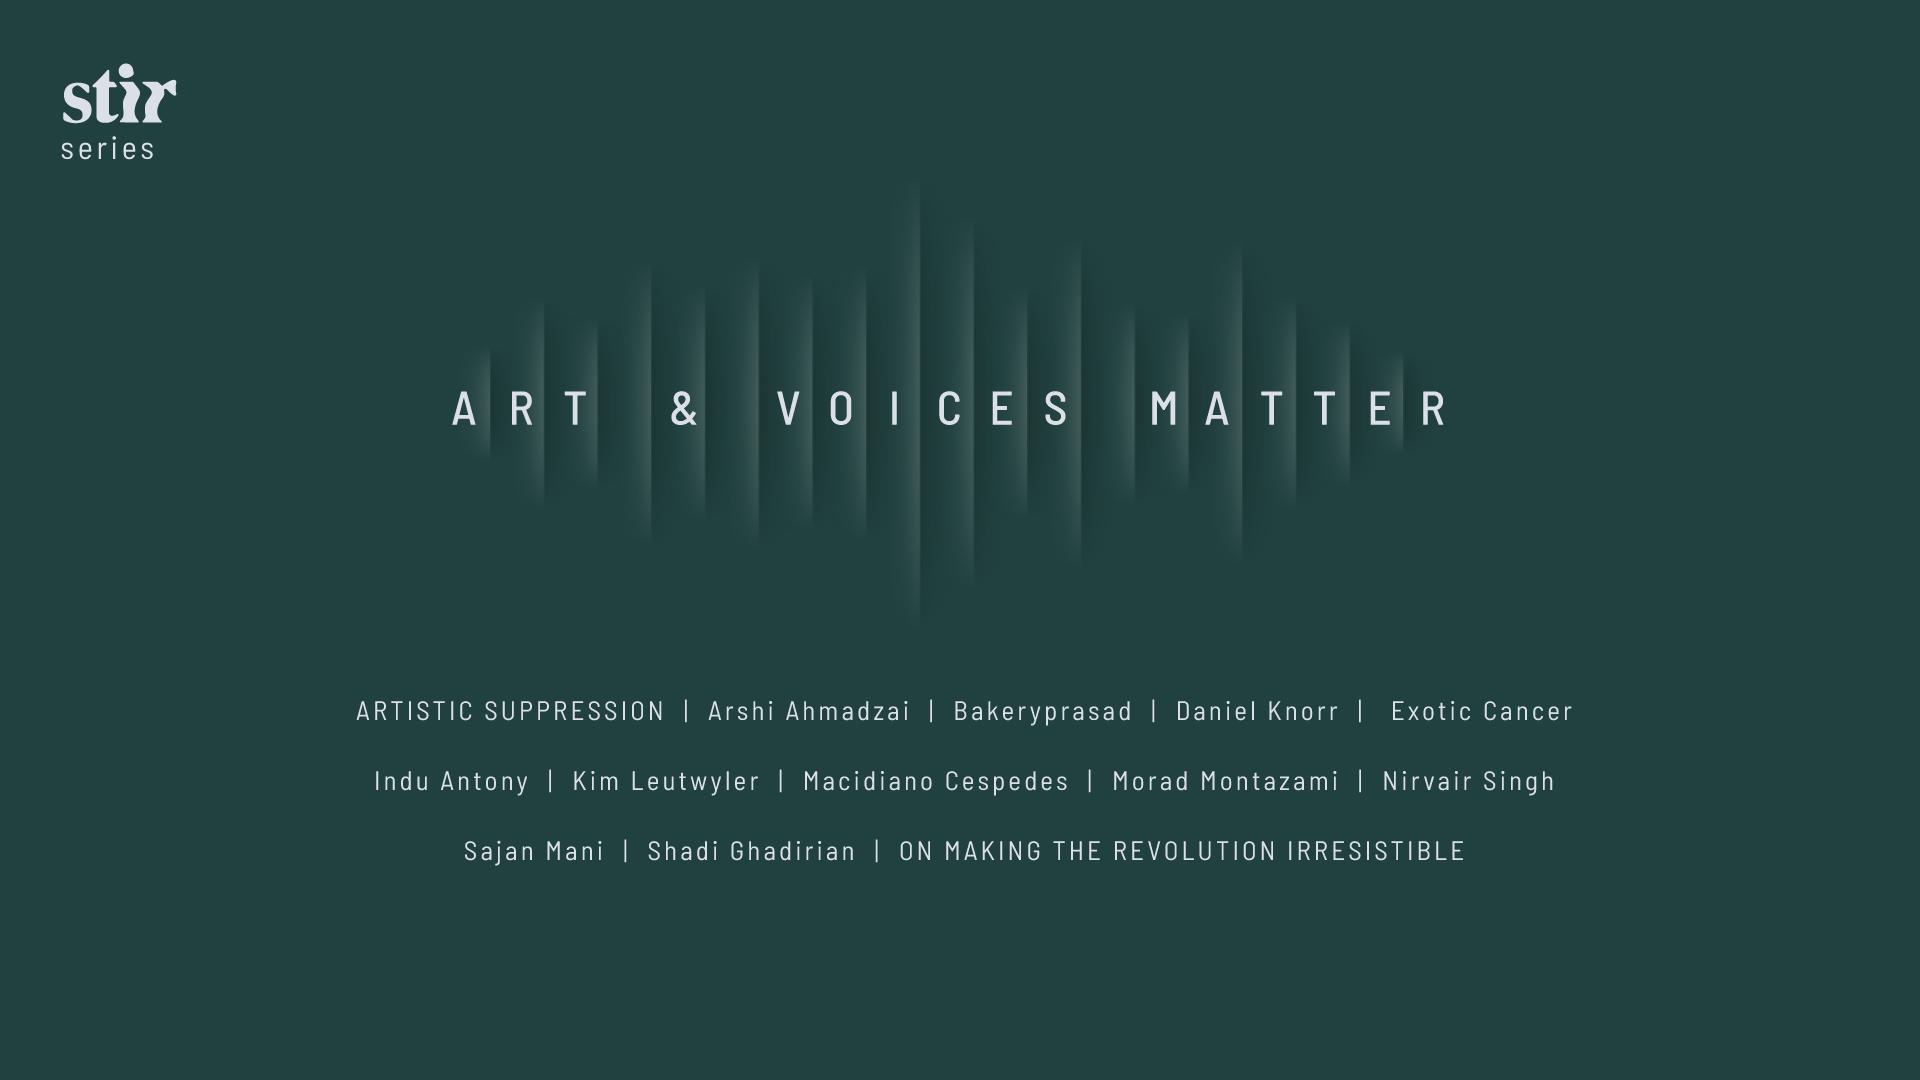 Art & Voices Matter: STIR original series on issues of communities at the margins | STIRworld